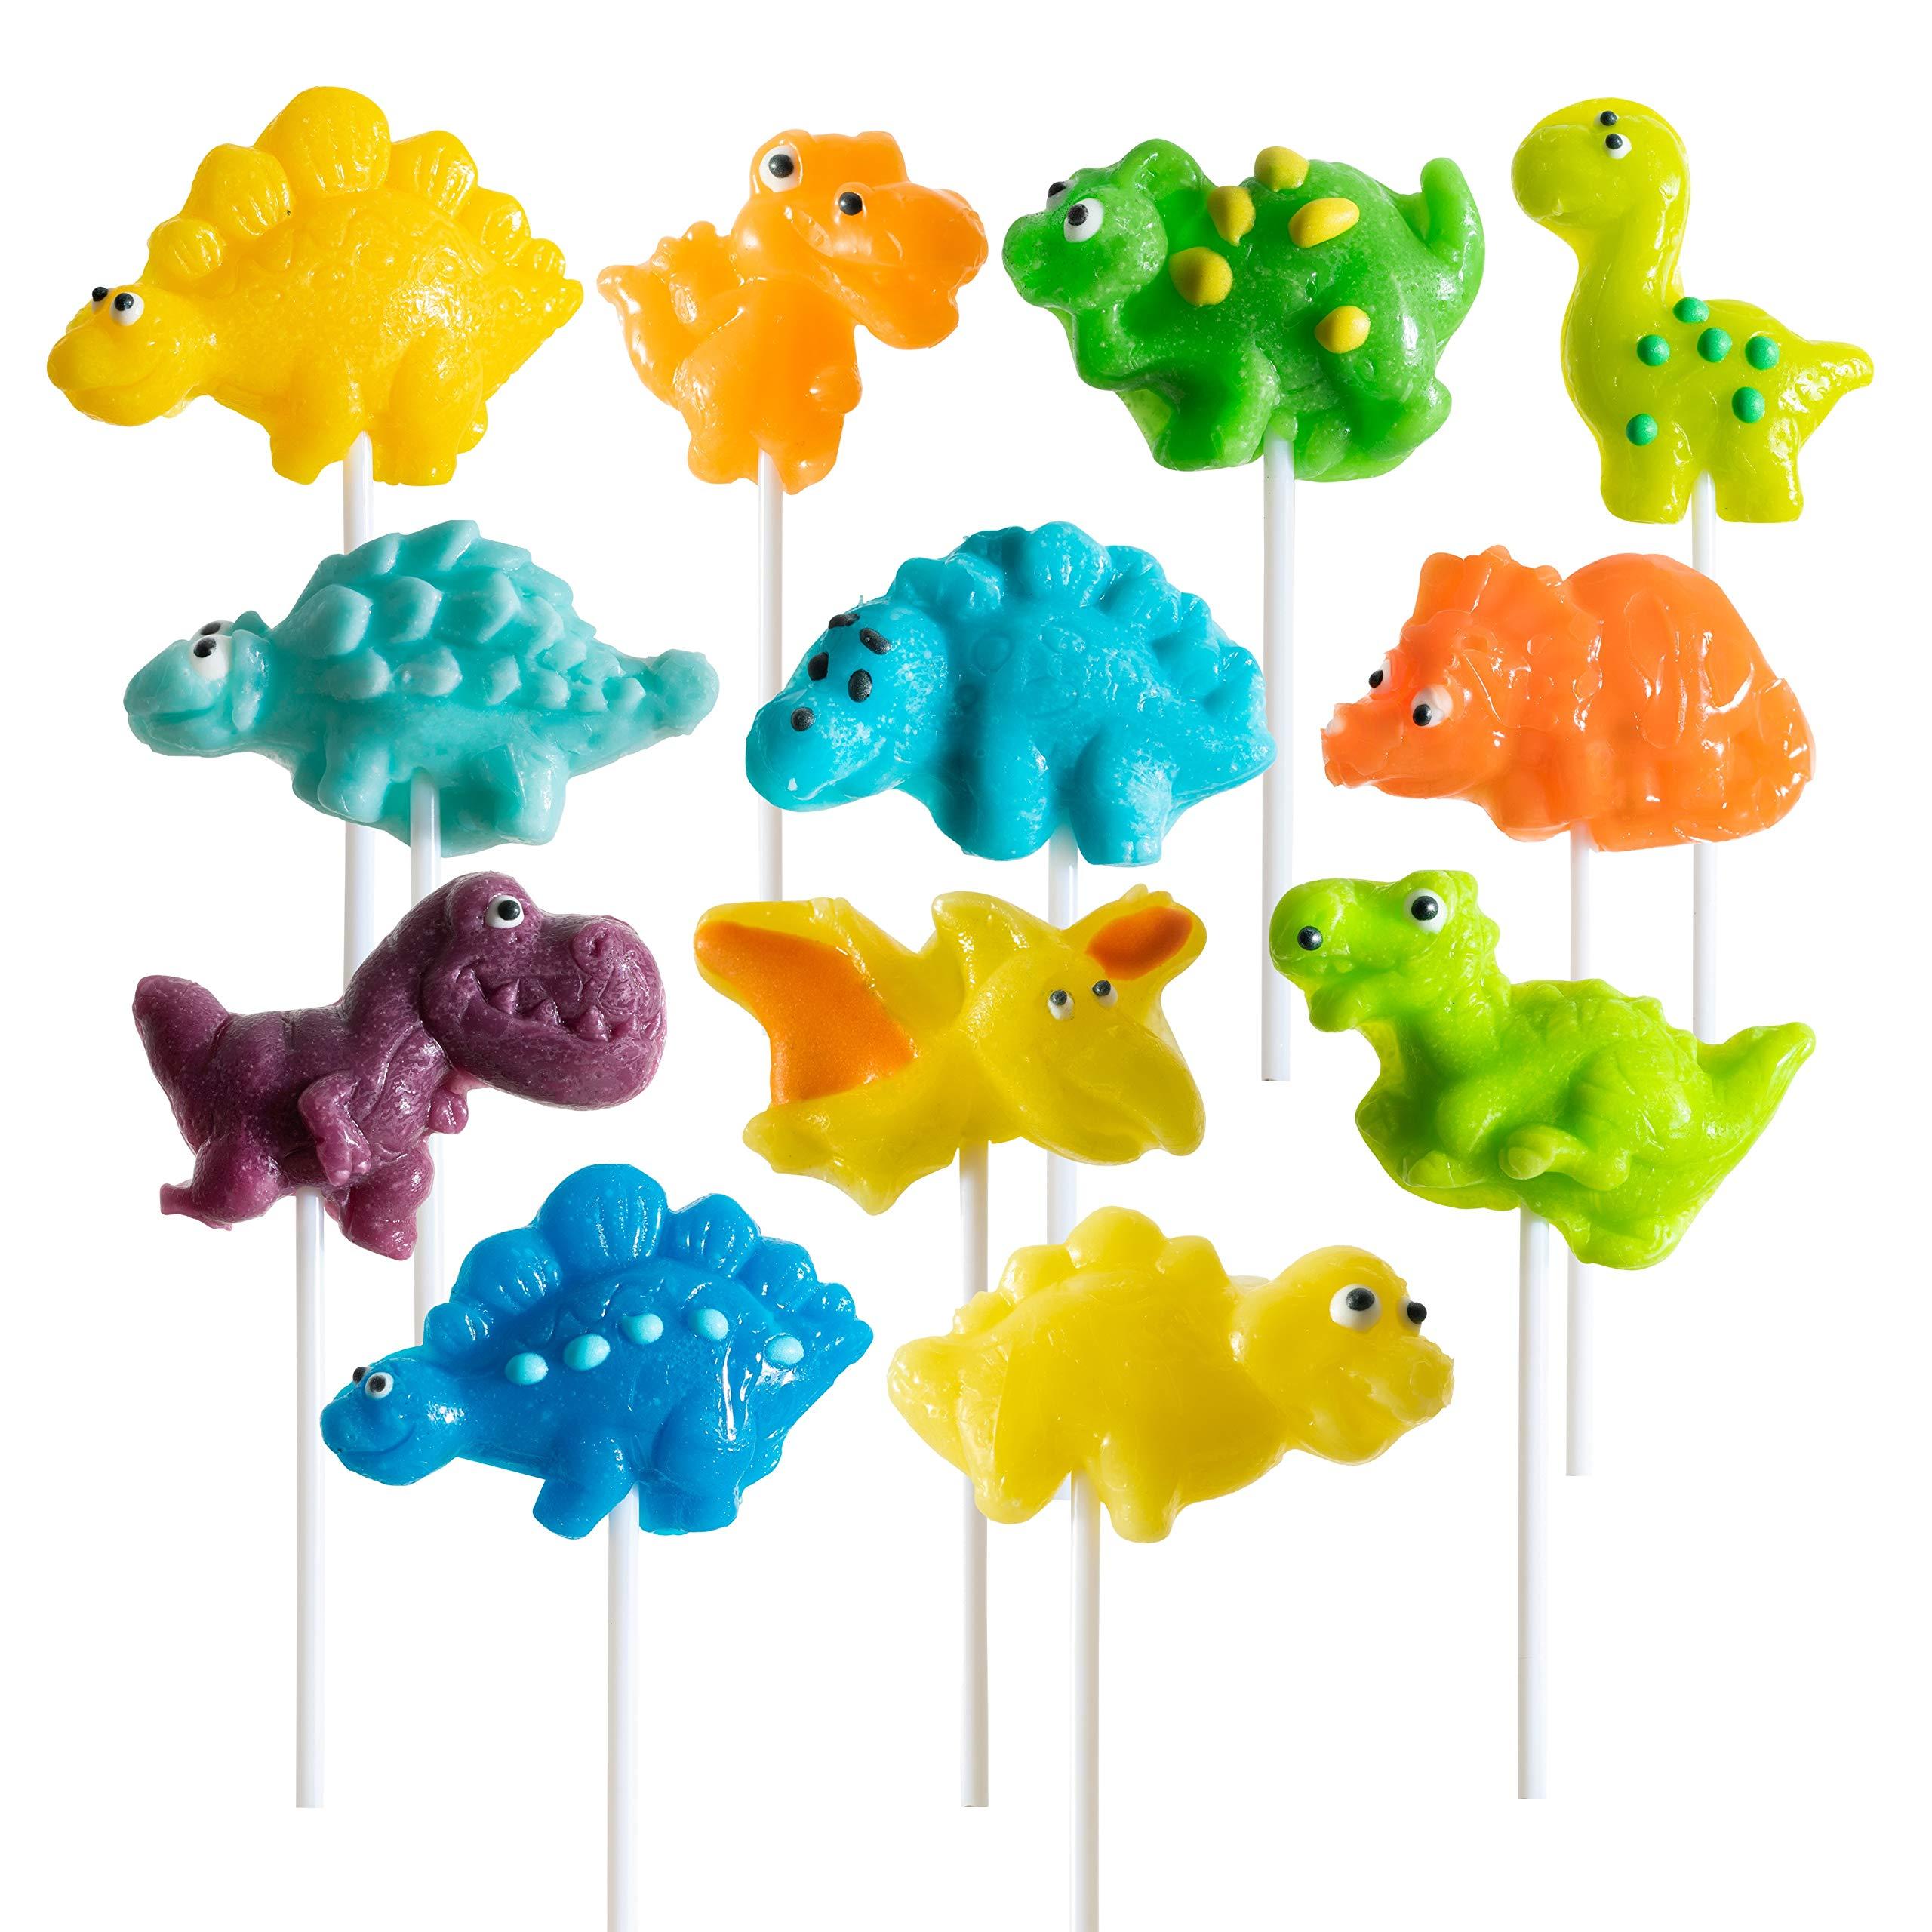 Prextex Dinosaur Lollipops Party Favors Dinosaur Suckers Pack of 12